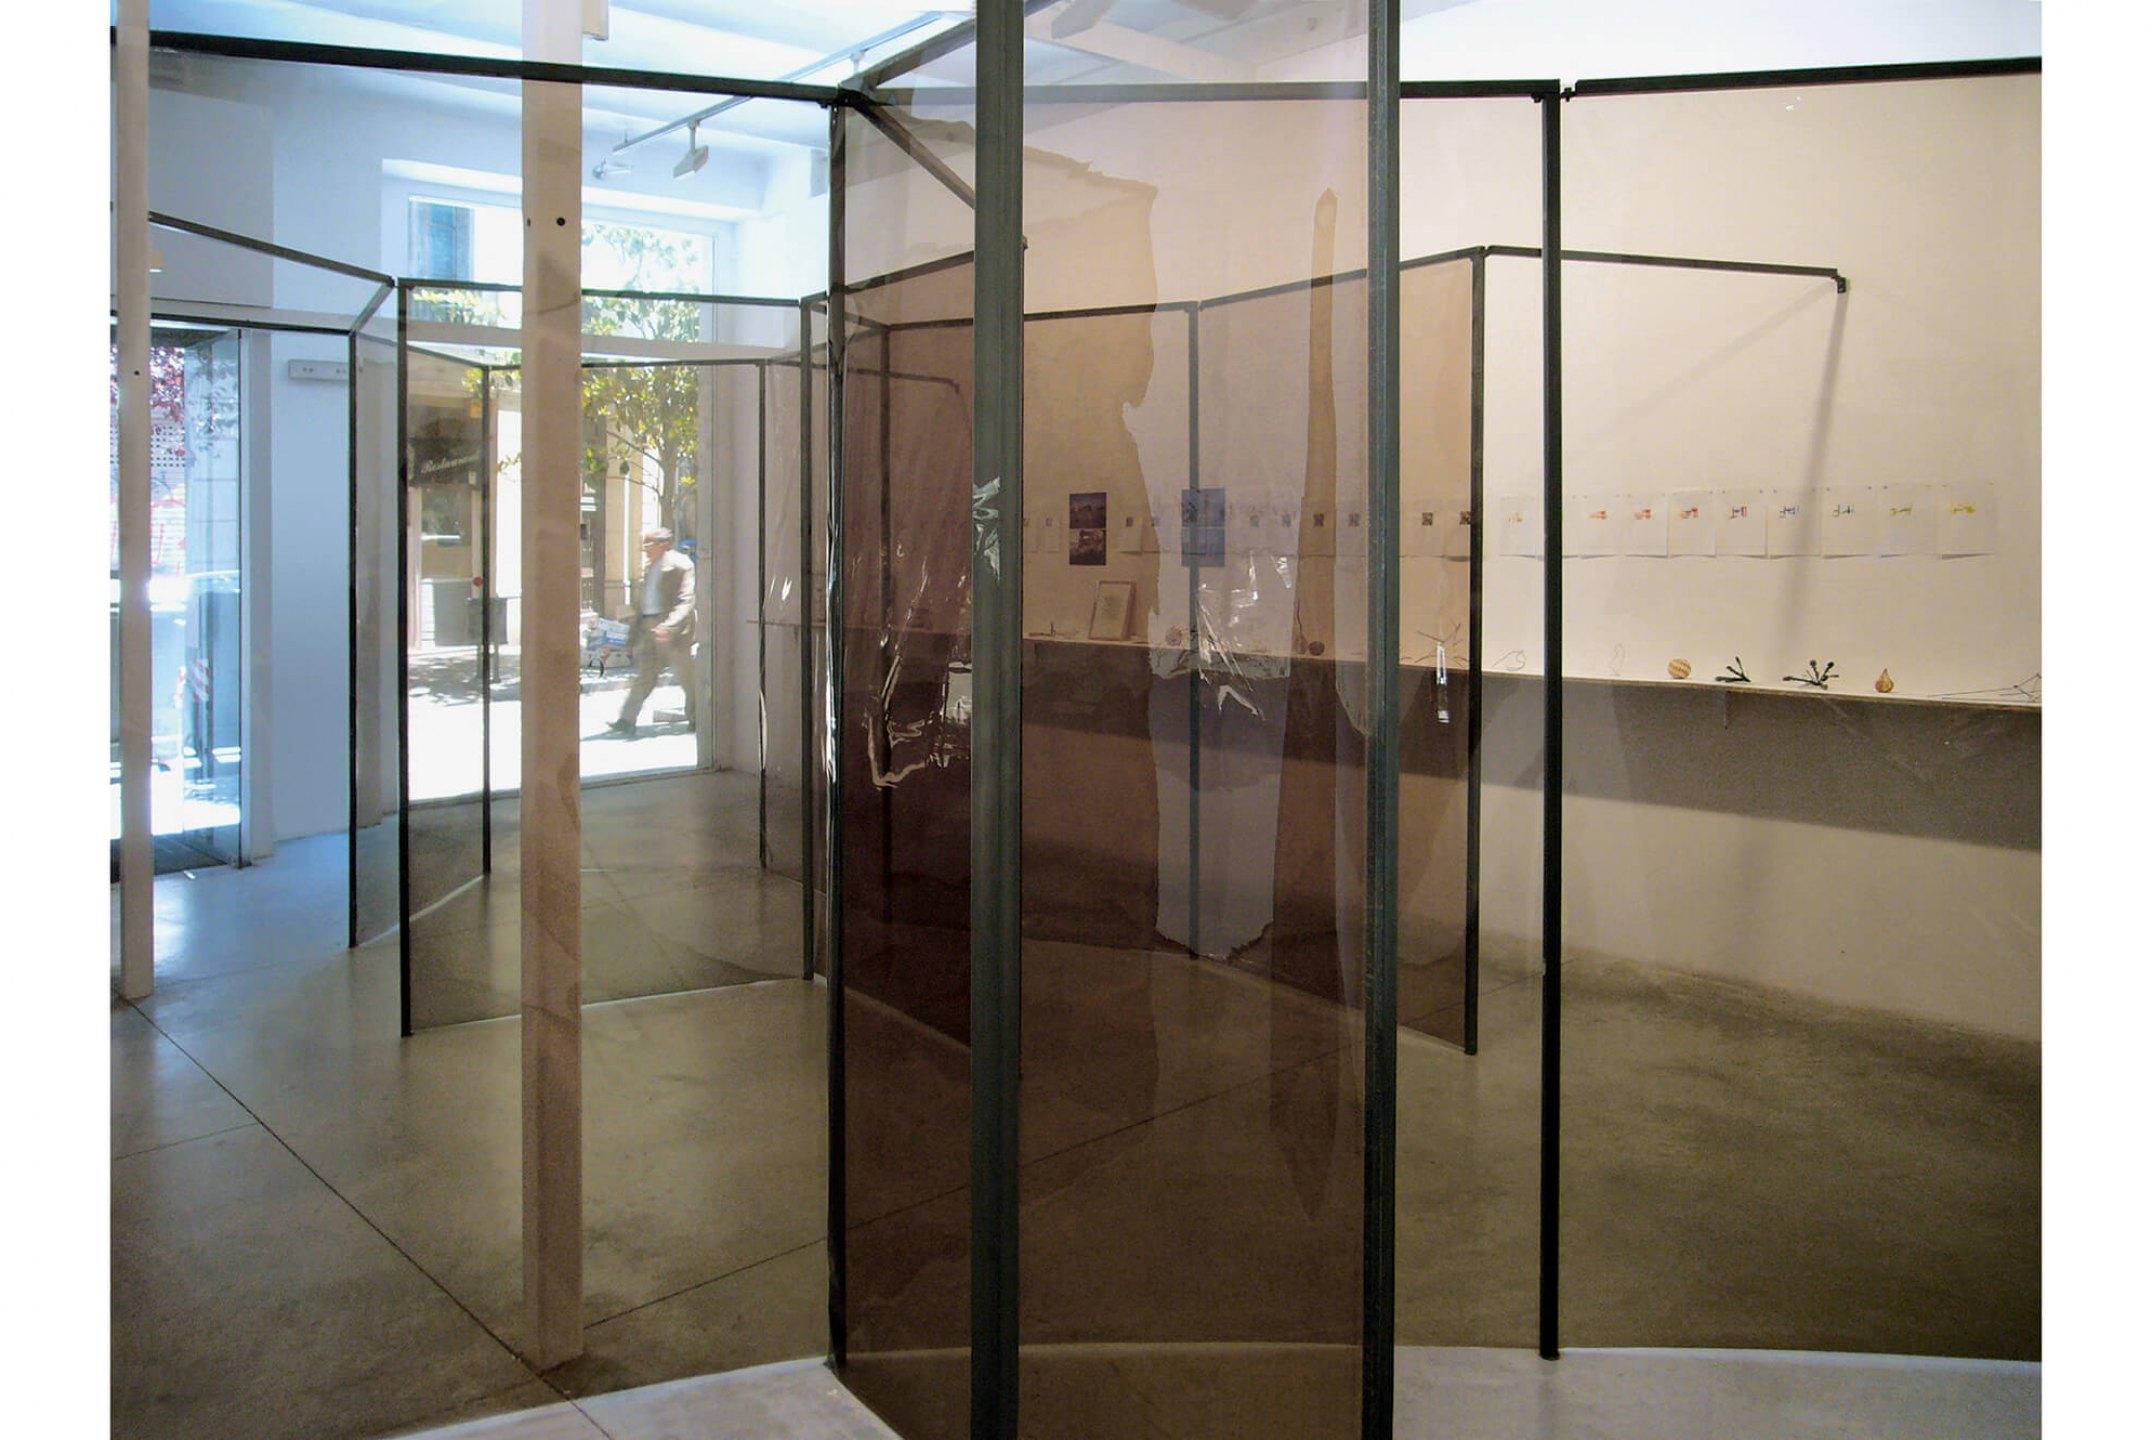 Daniel Steegmann Mangrané,<em>Resum/Trabalho</em>,2006, steel modular structure, photographic filter, shelves, variable dimensions - Mendes Wood DM